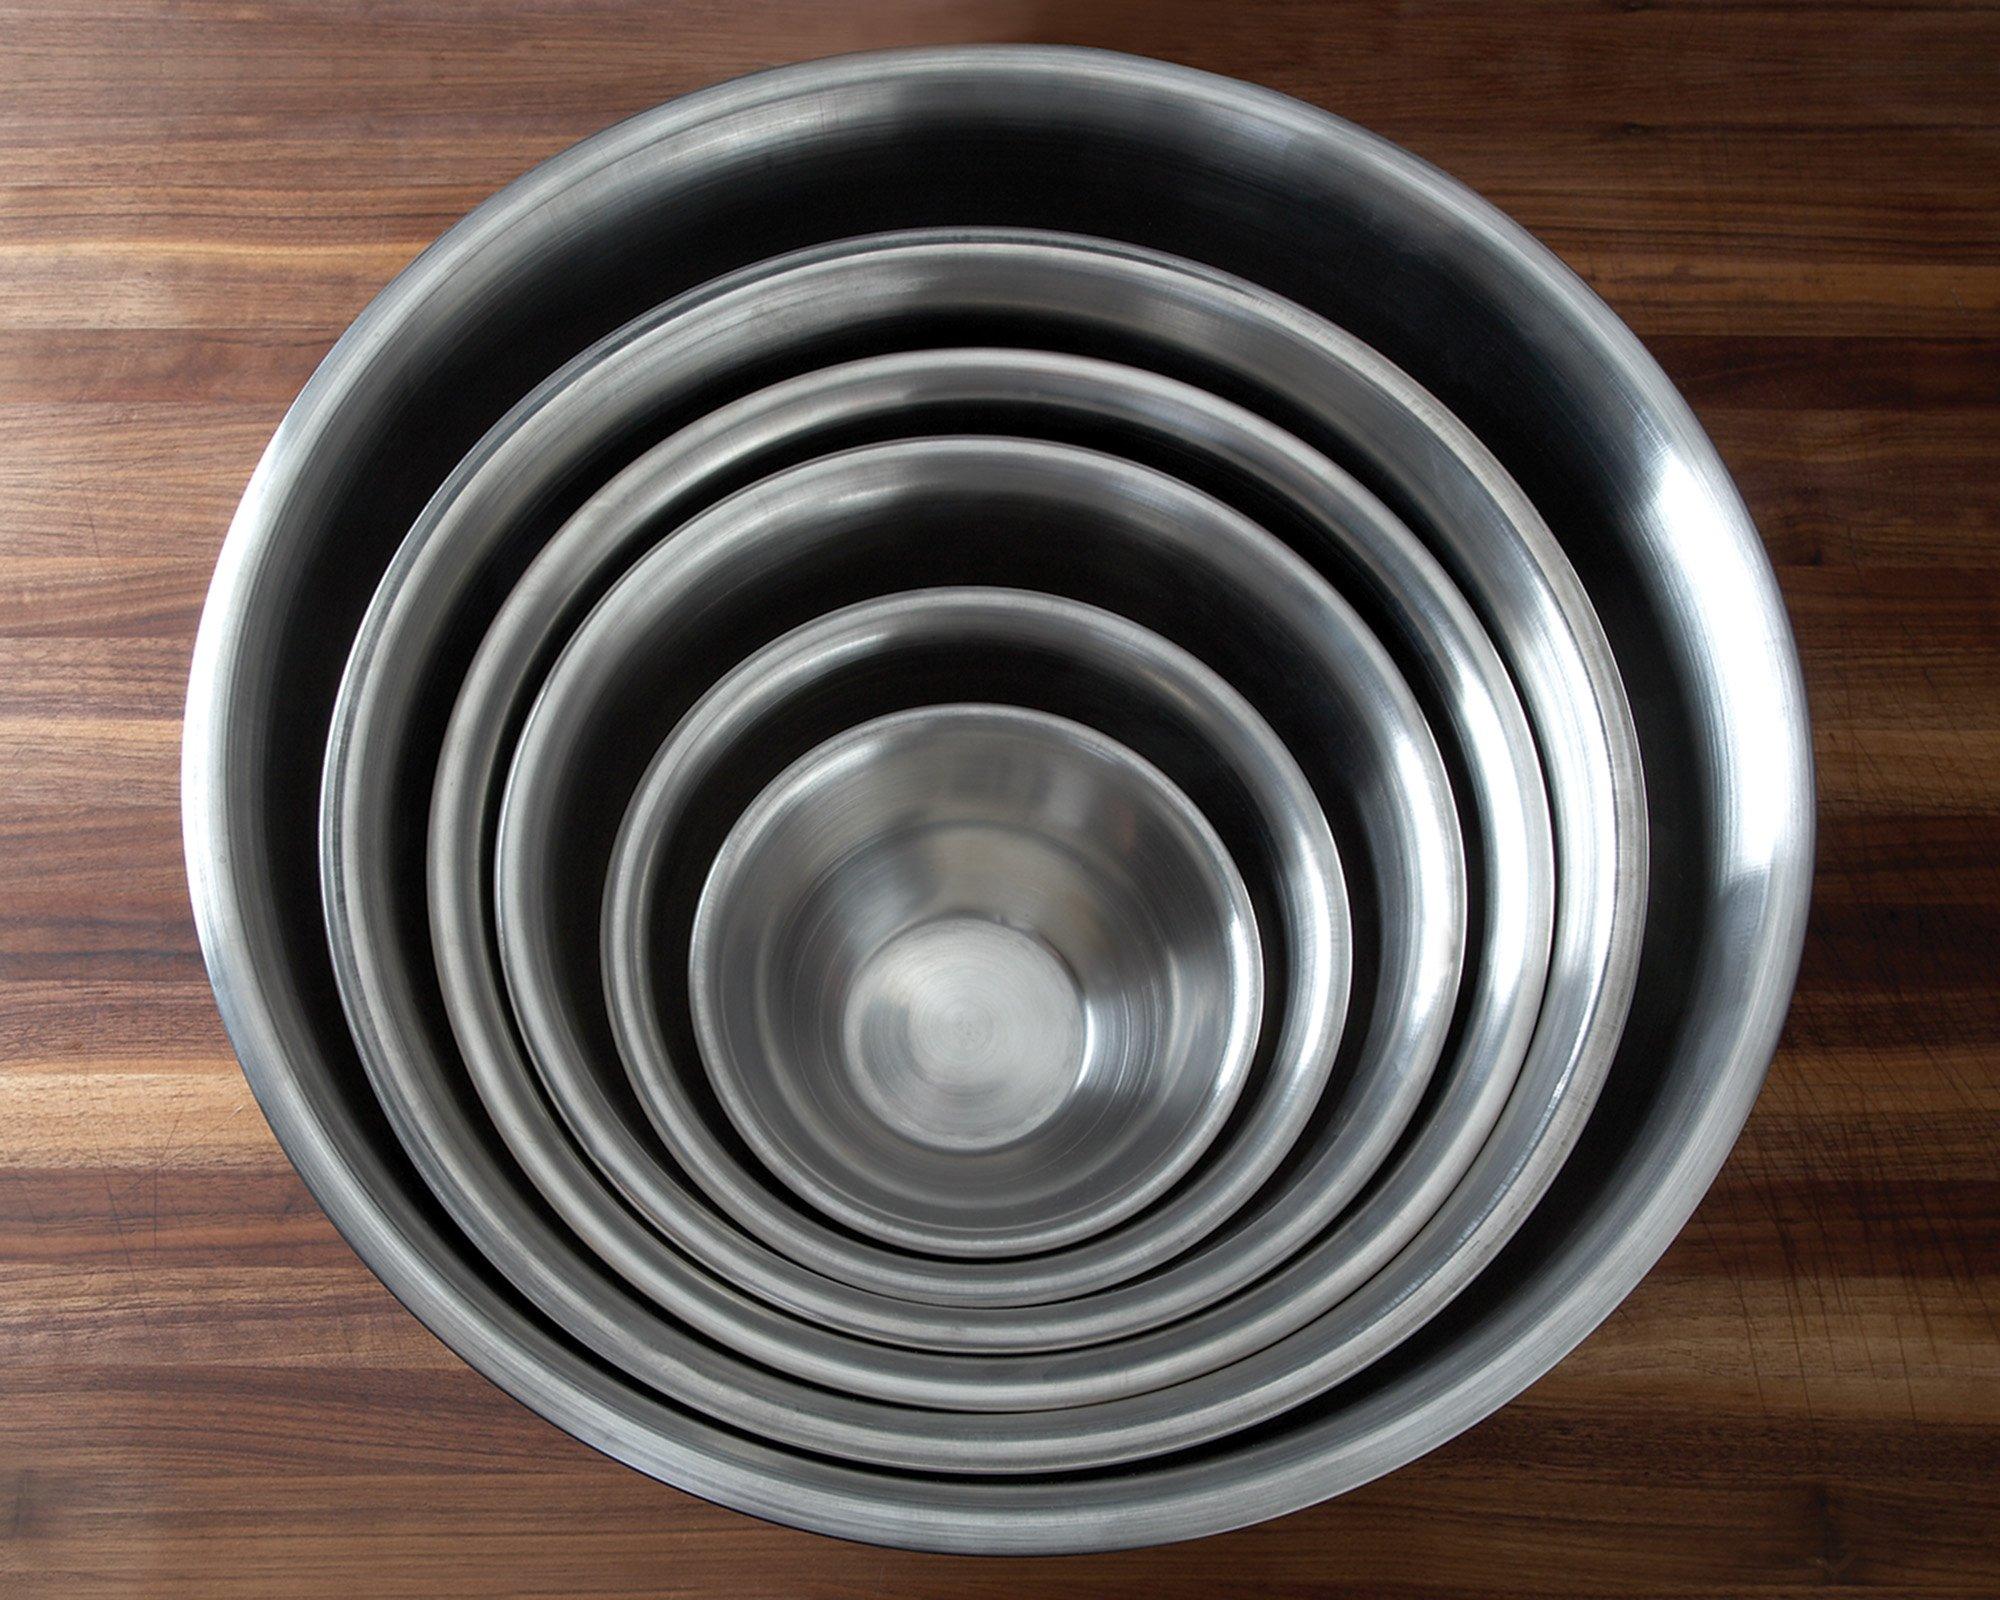 Fox Run 5-Quart Stainless Steel Mixing Bowl by Fox Run (Image #7)